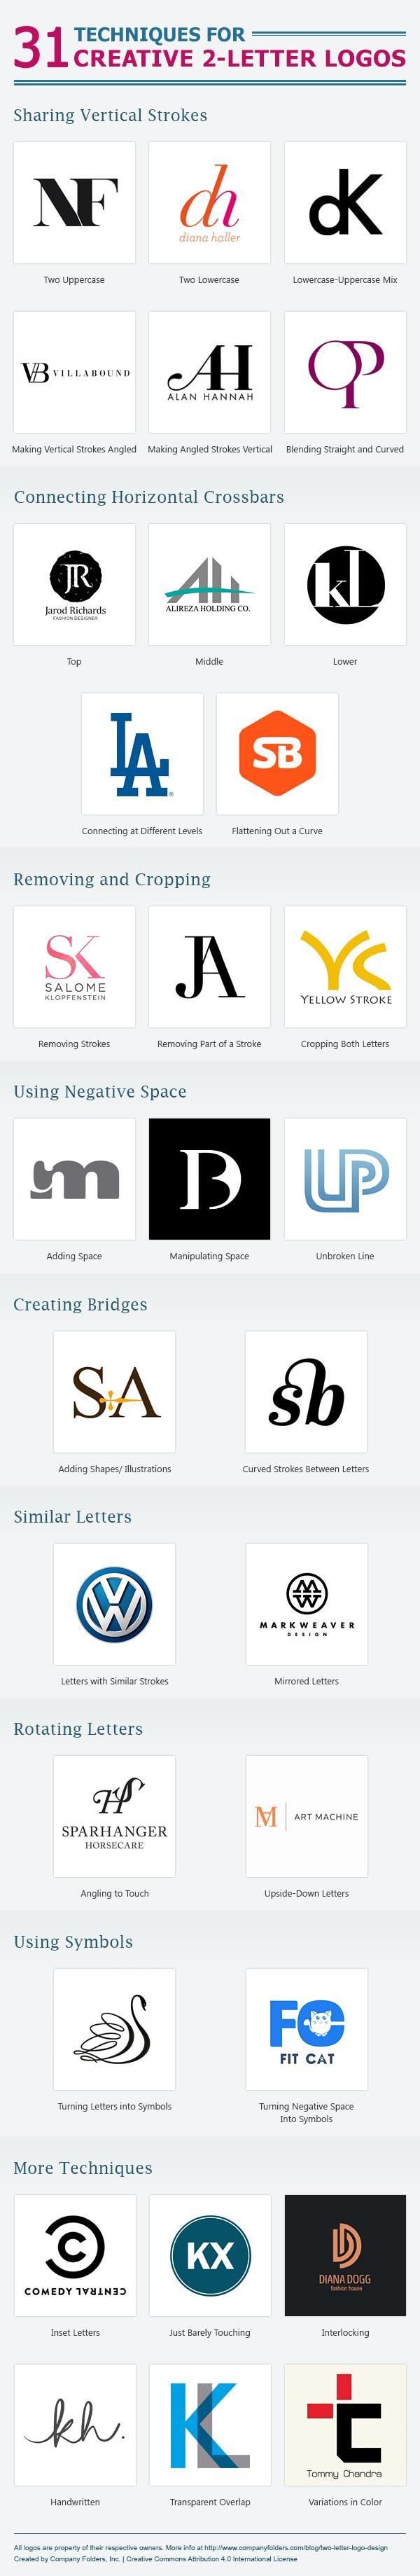 logos-for-job-search